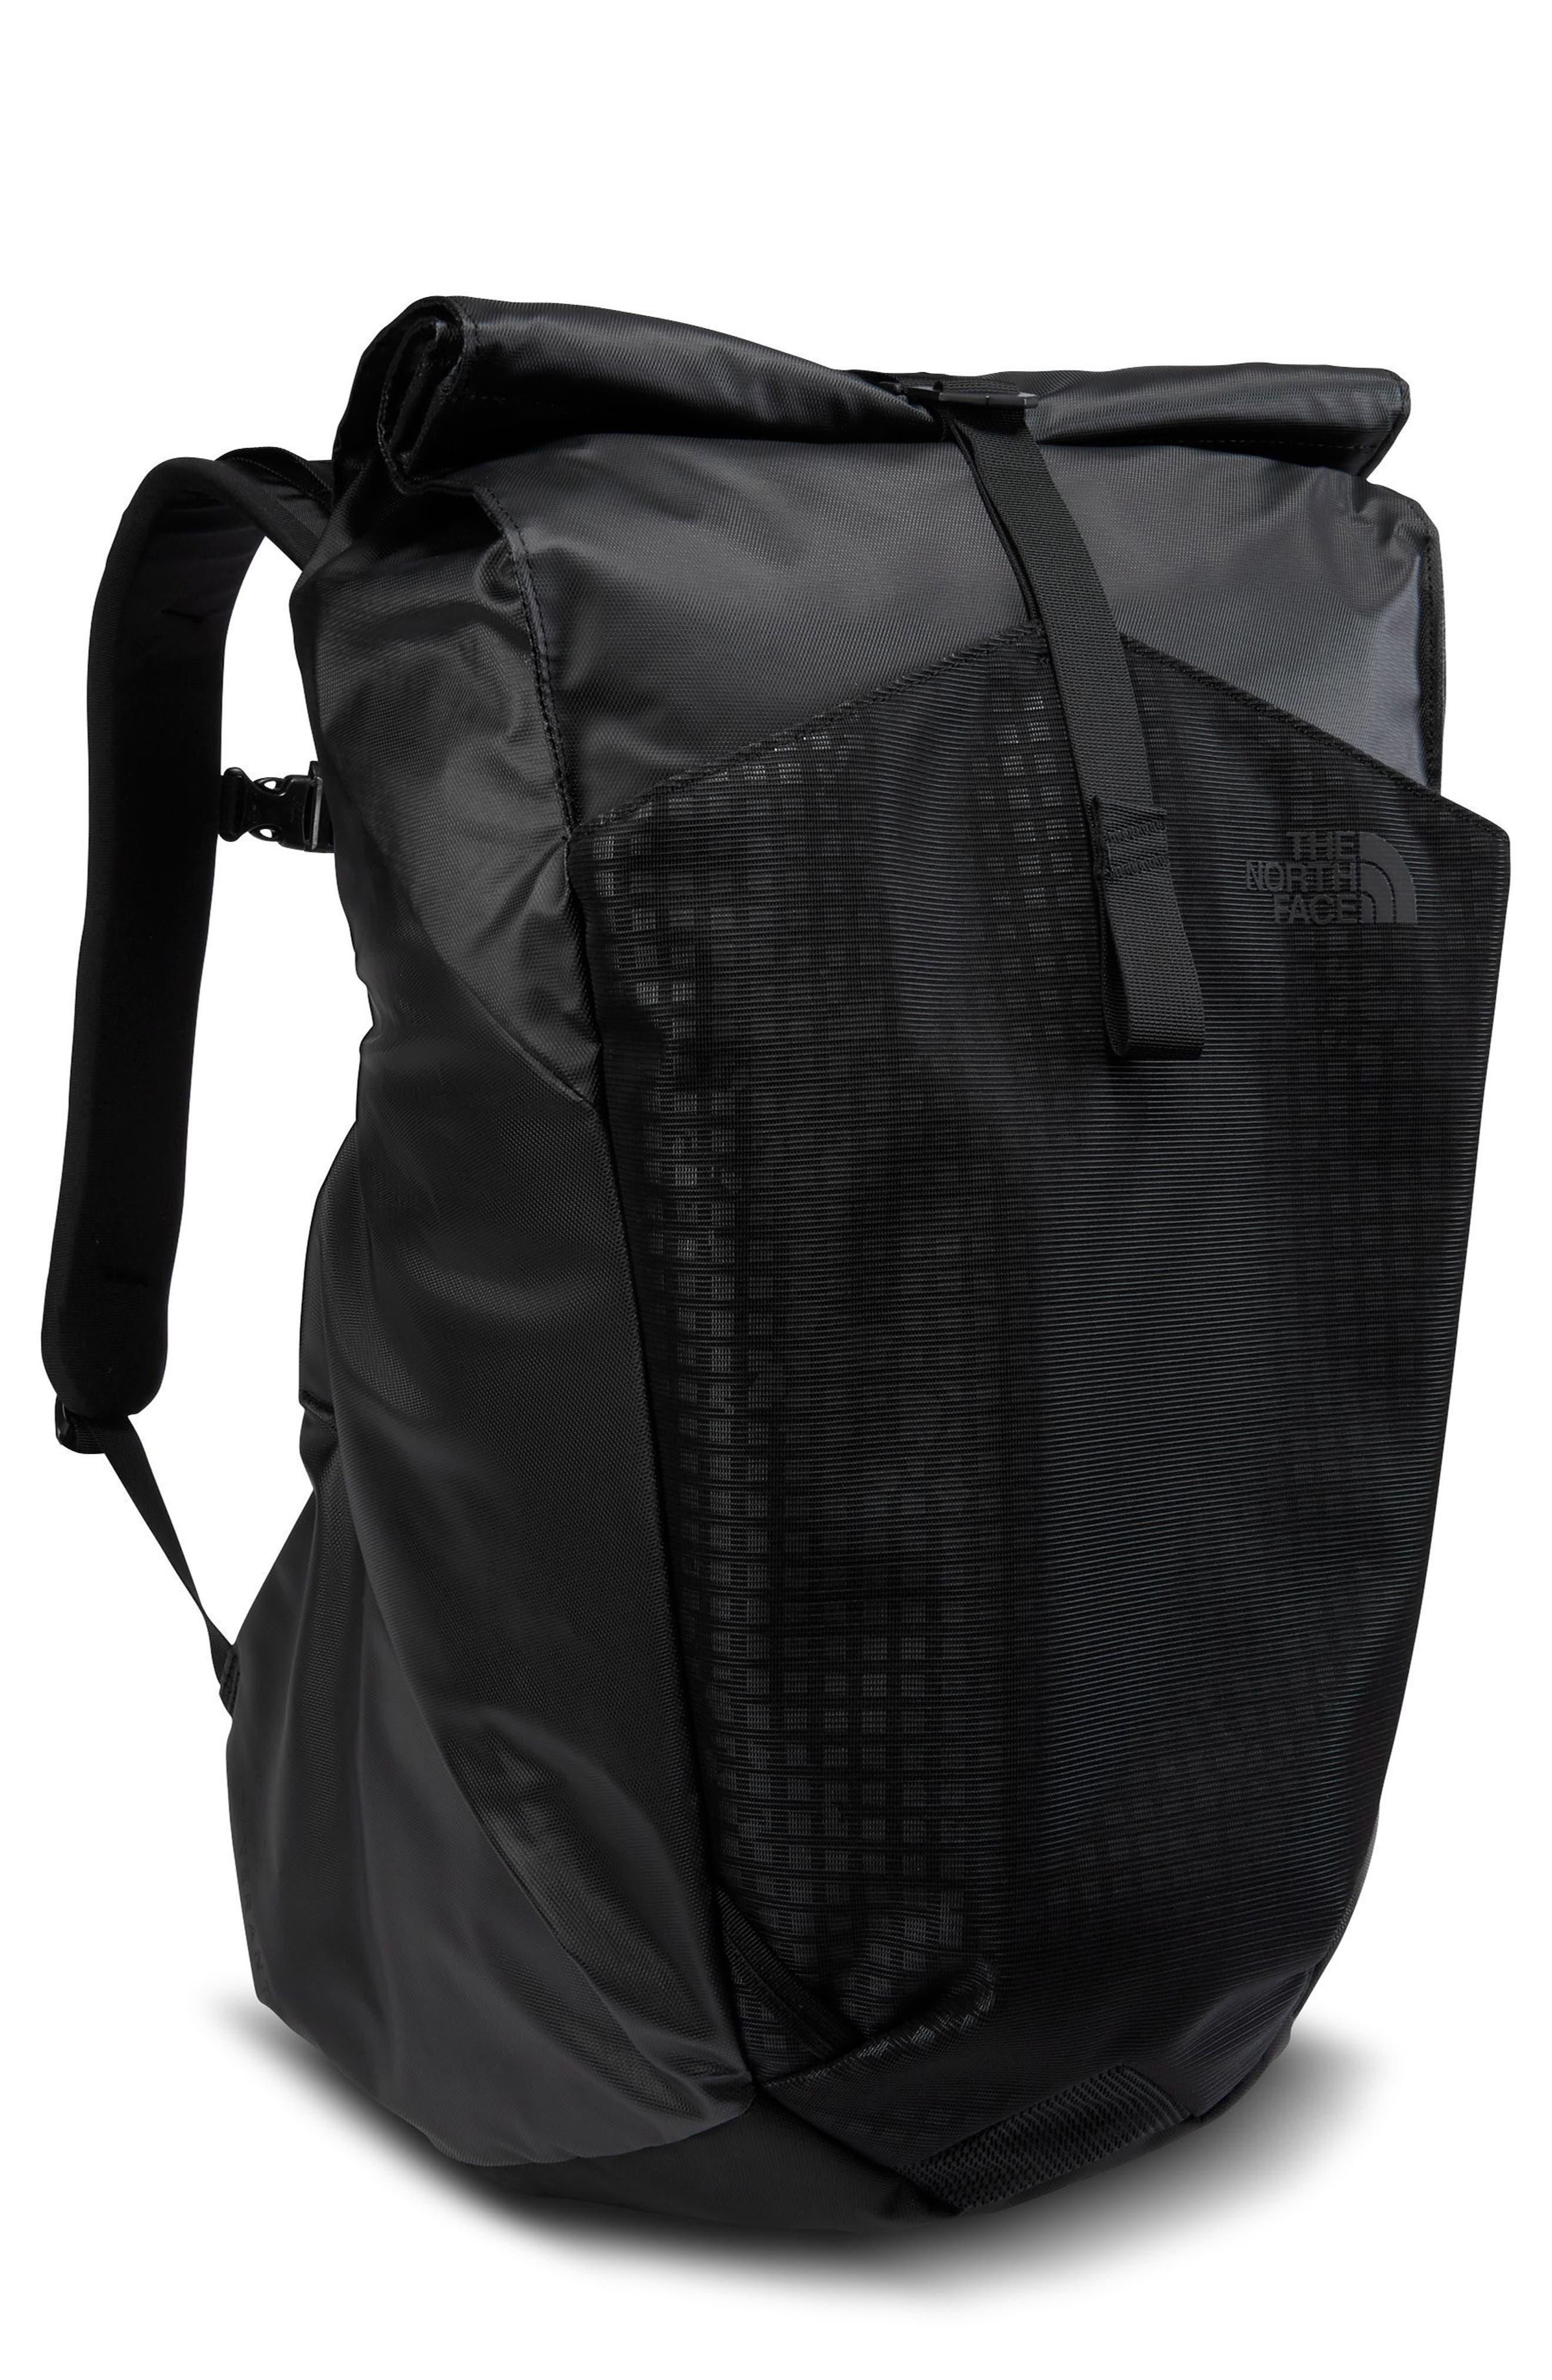 Itinerant Backpack,                             Main thumbnail 1, color,                             Tnf Black